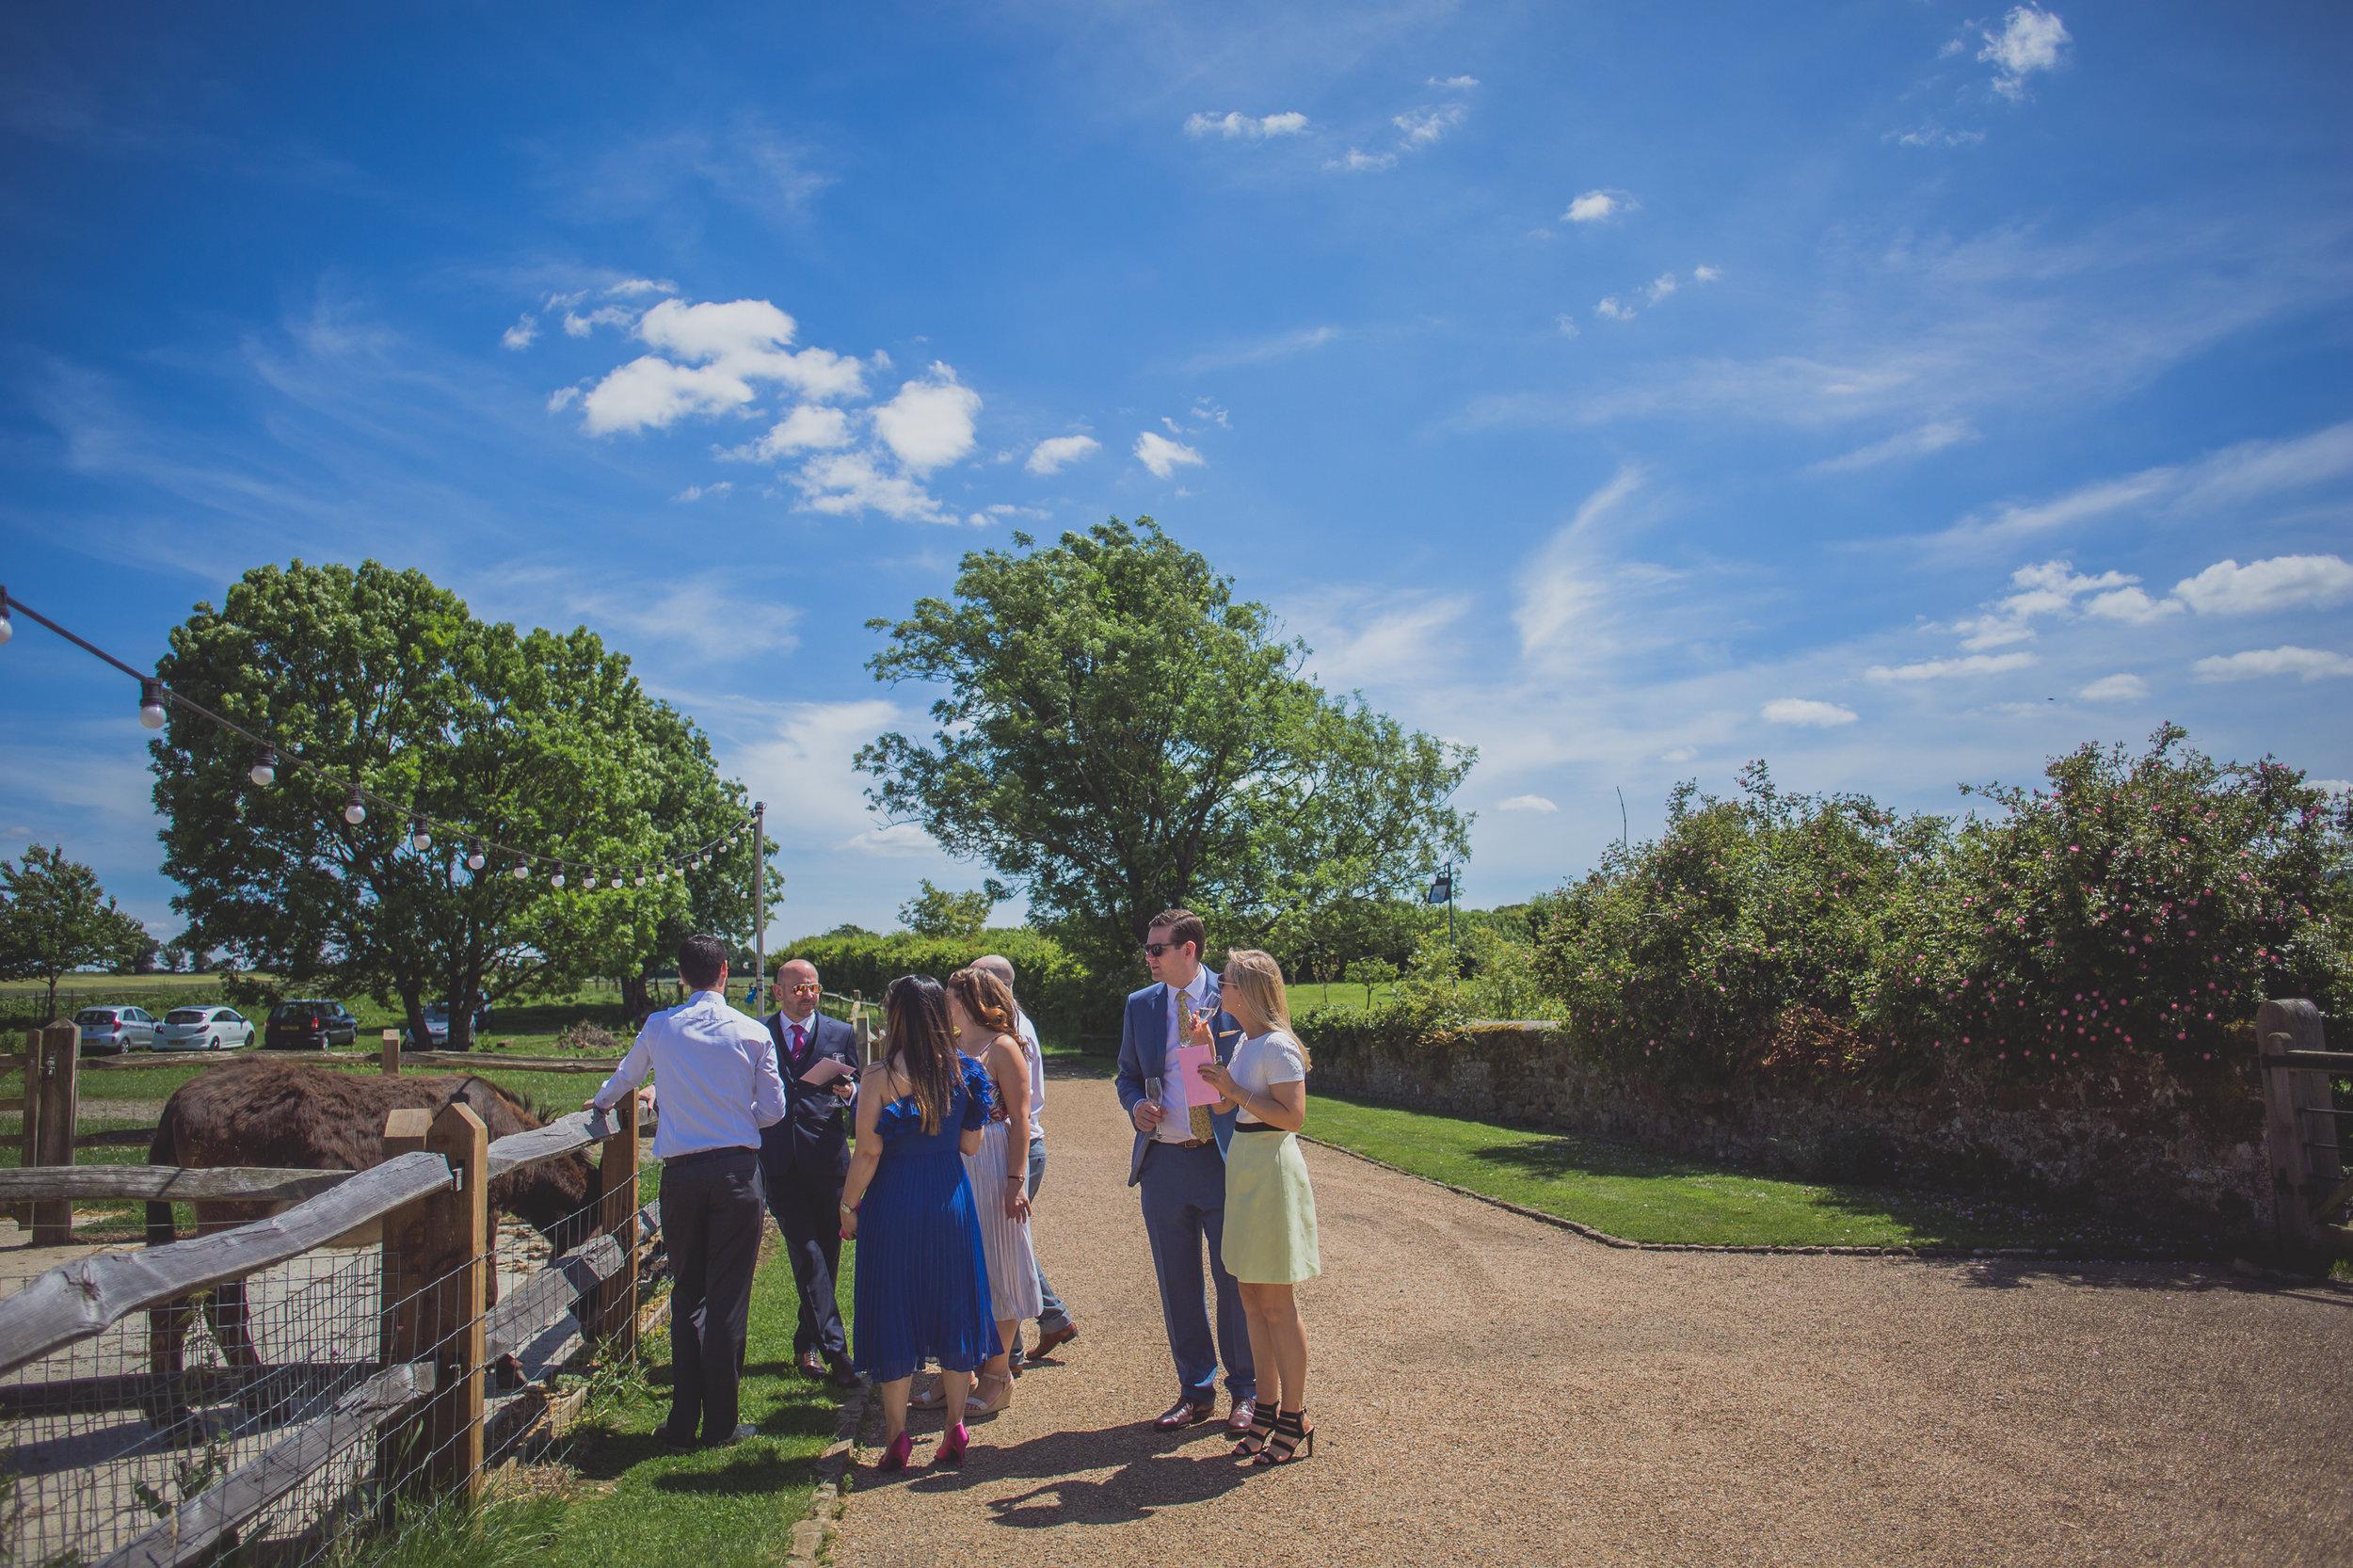 Grittenham Barn female wedding photographers west sussex petworth social-85.jpg